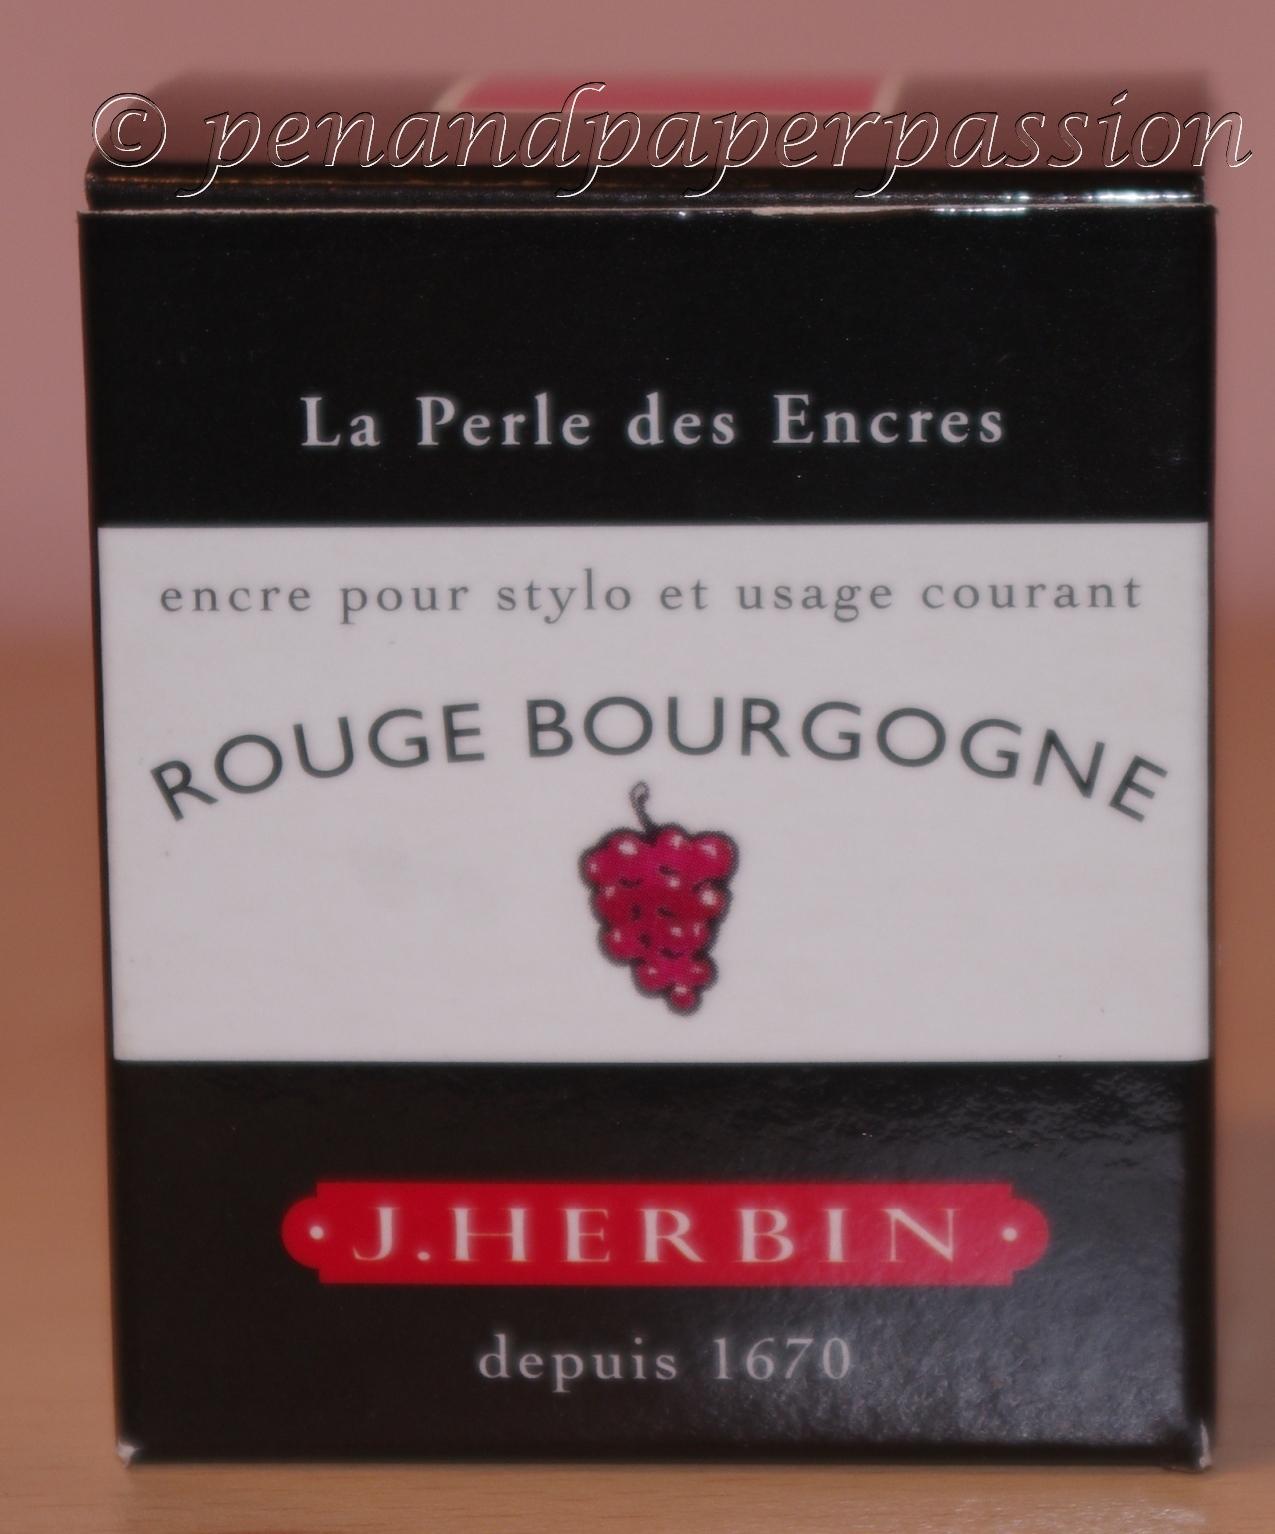 J. Herbin Rouge Bourgogne Verpackung